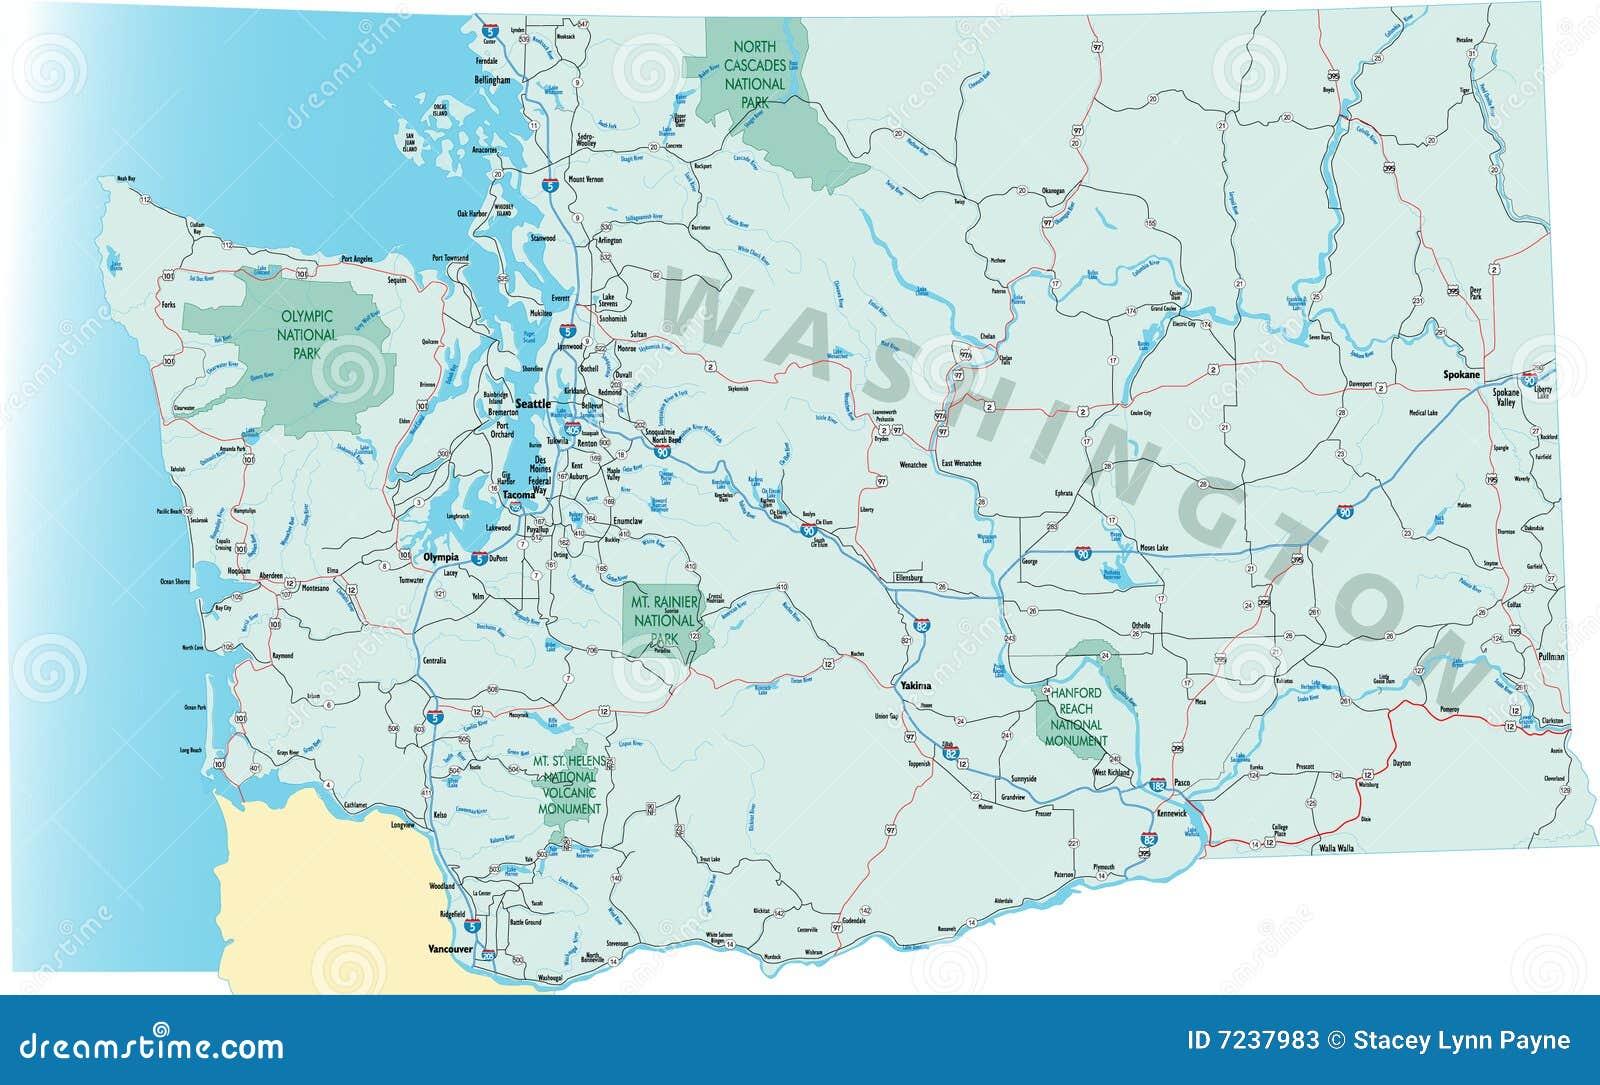 Washington State Road Map Stock Photos  Image 7237983